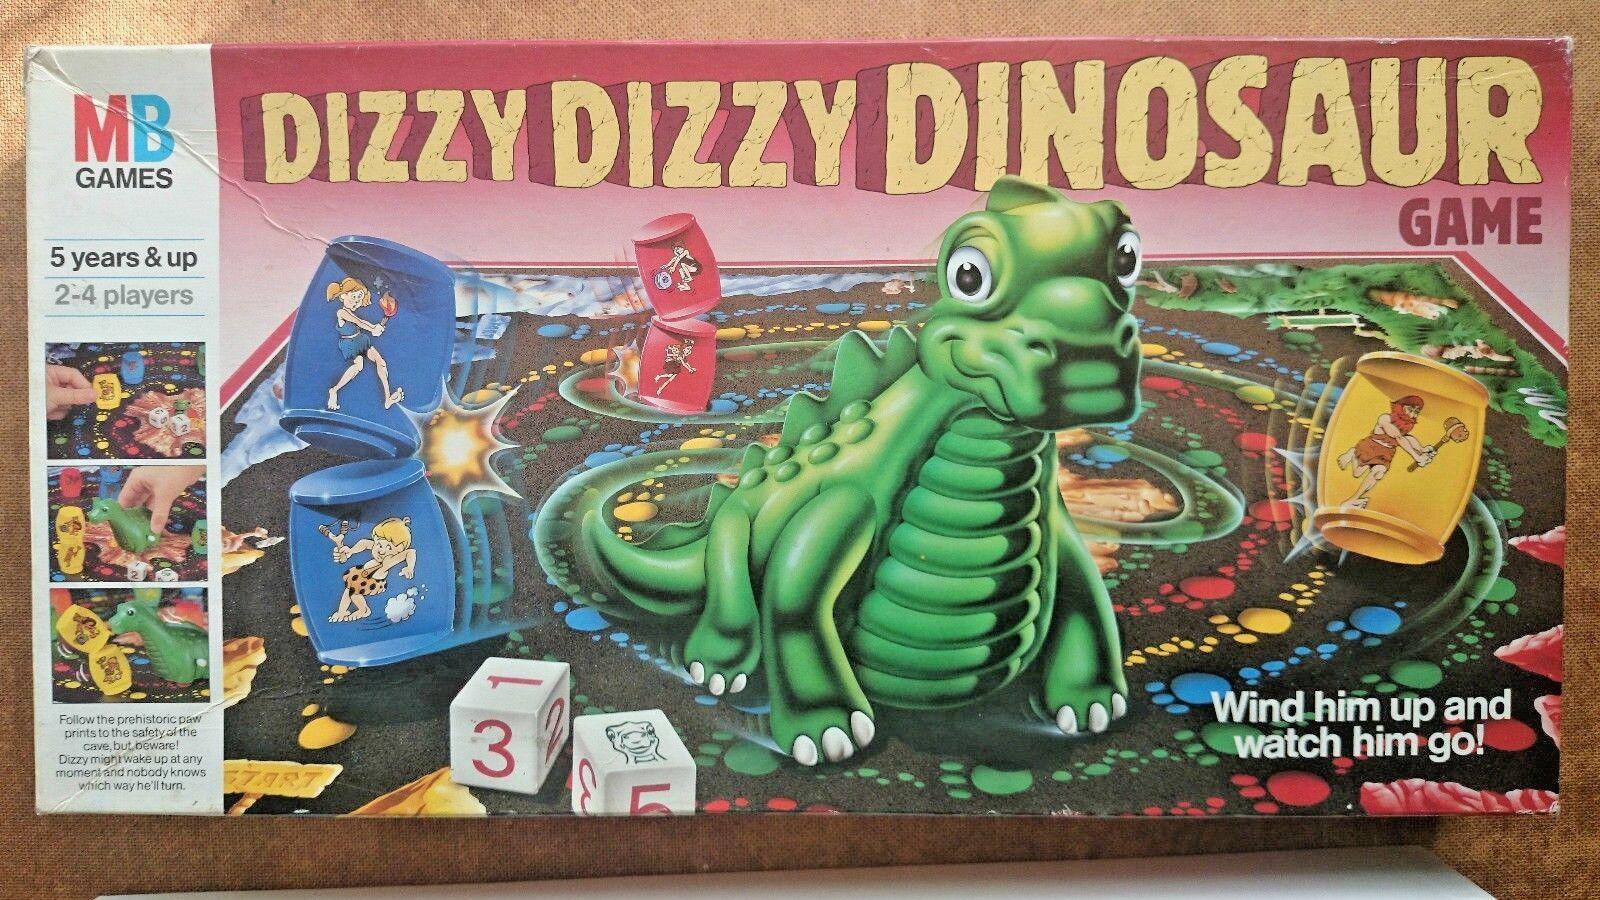 Dizzy Dizzy Dinosaur Dinosaur Dinosaur  MB 1987 2c4087